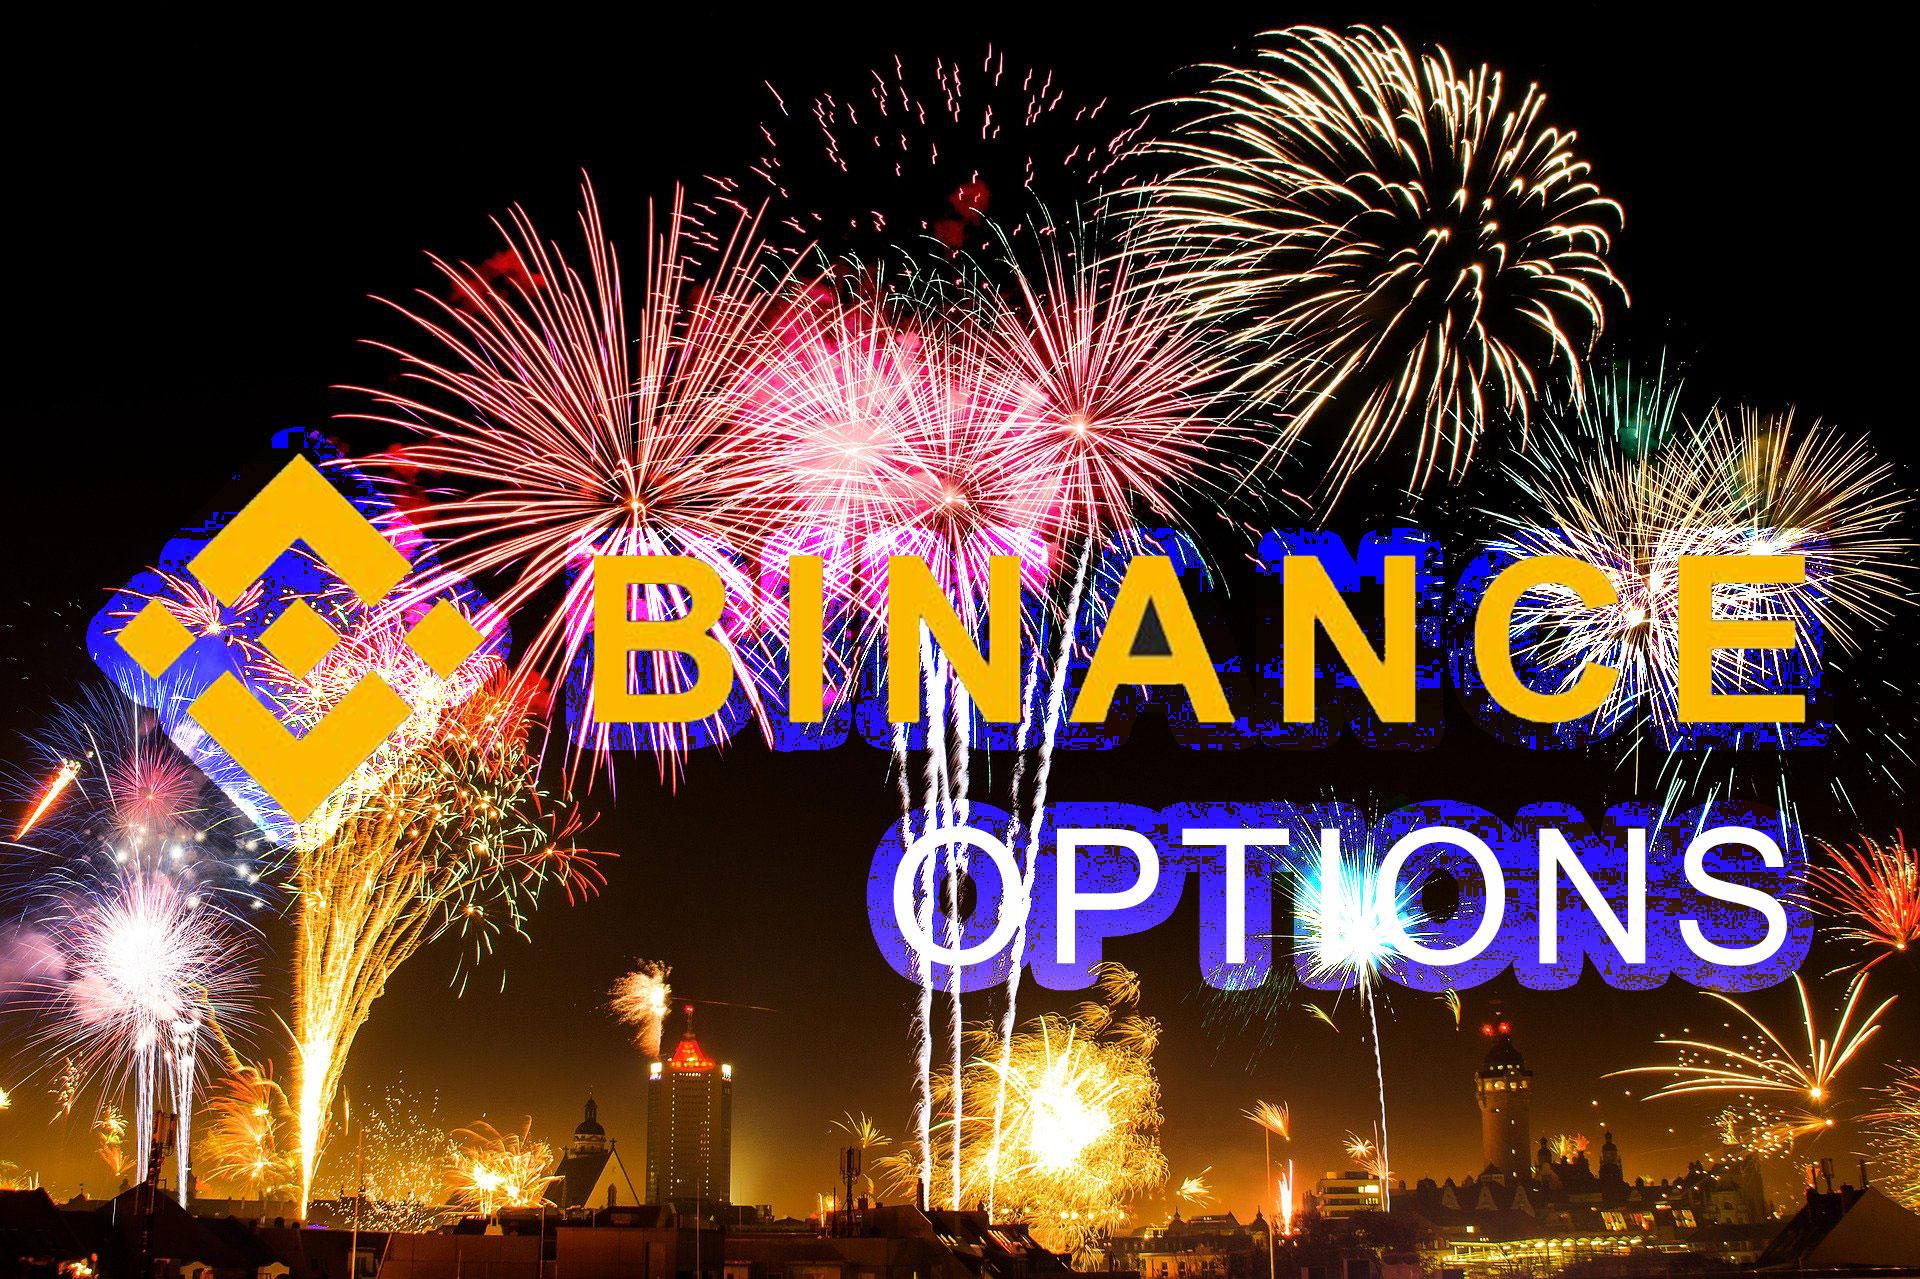 Binanceがビットコインのオプション取引をモバイルで提供開始